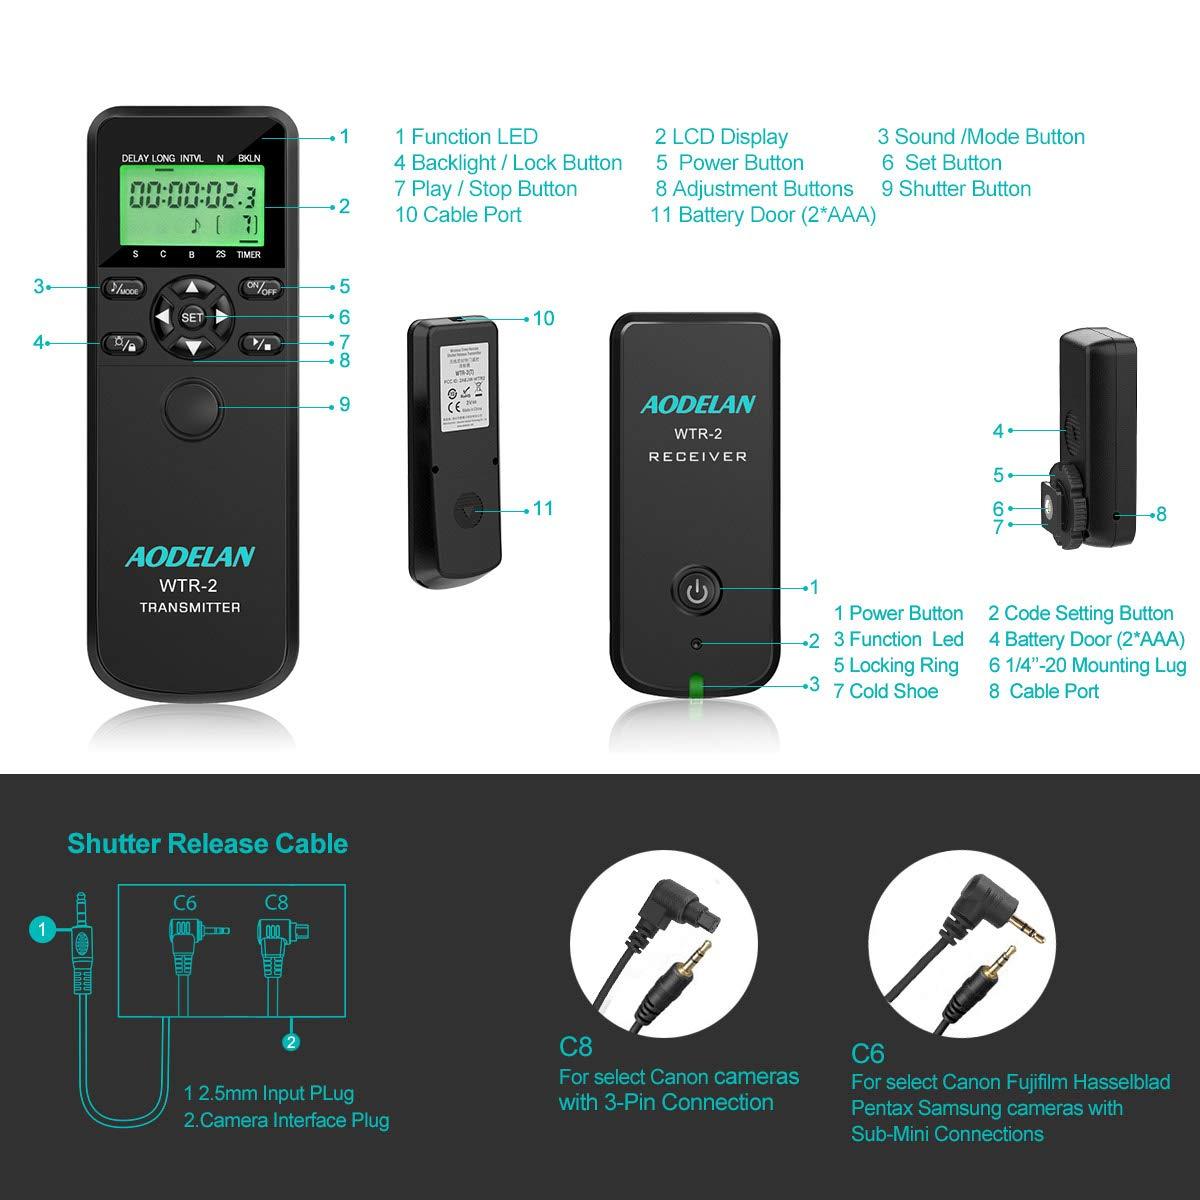 AODELAN Timelapse Telecomando Wireless Comando a distanza wireless con telecomando a due cavi per Canon Fujifilm Pentax Samsung Contax Sigma Fotocamere